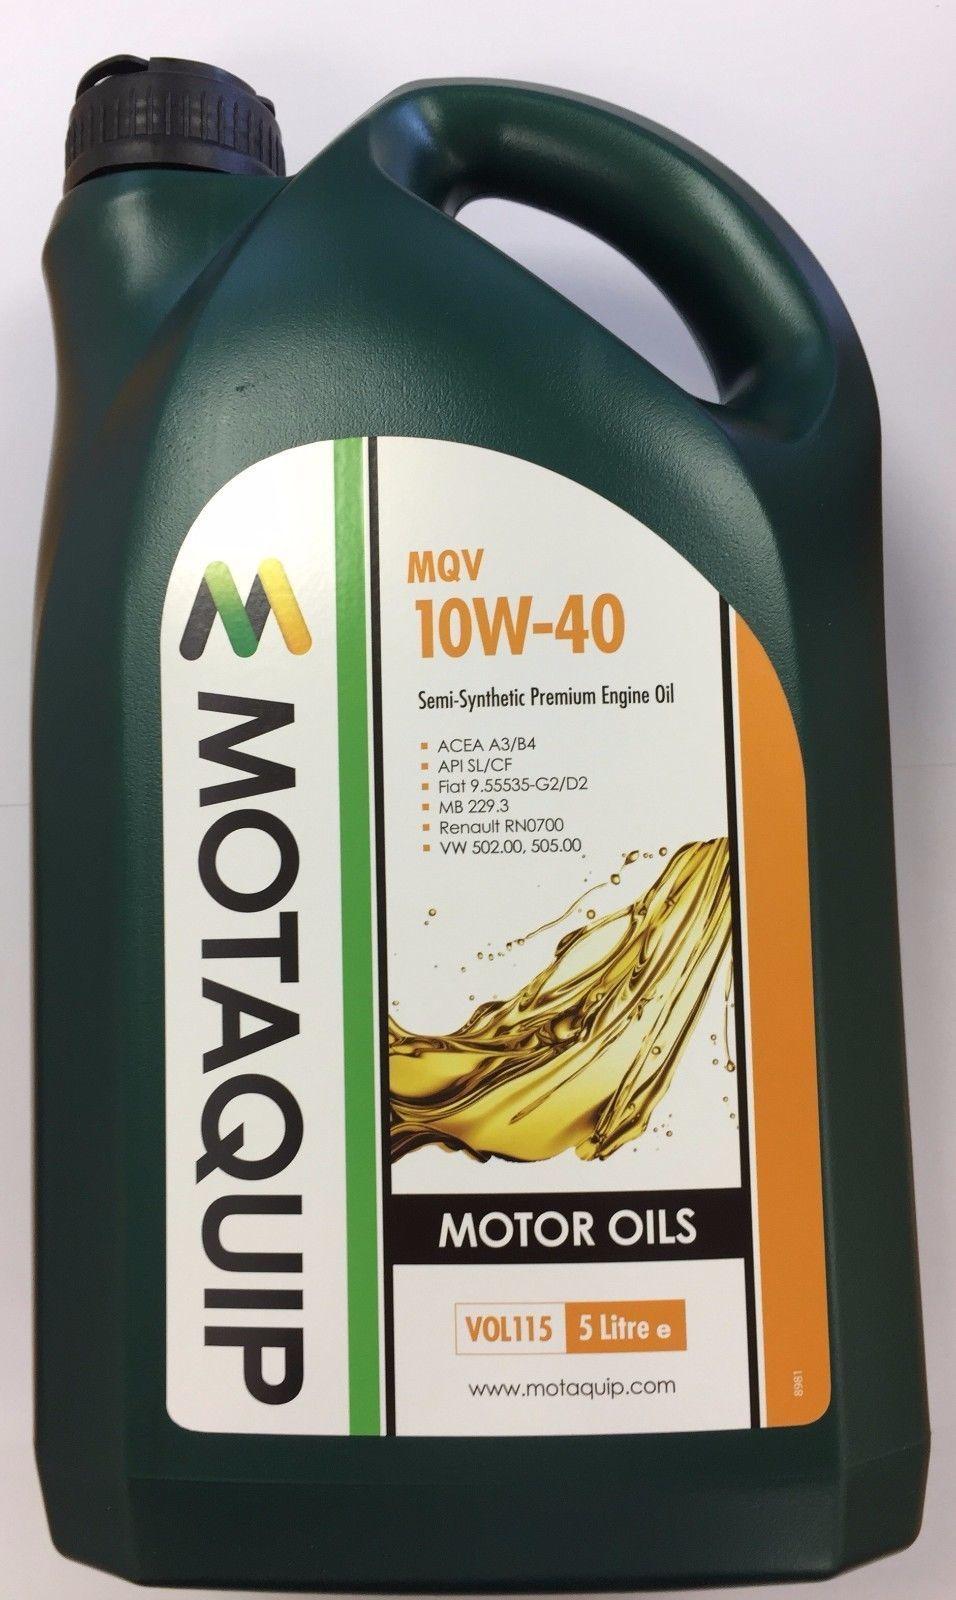 Motaquip 10w40 Semi Synthetic Engine Oil 5L - £11.39 @ car_part_supermarket / eBay